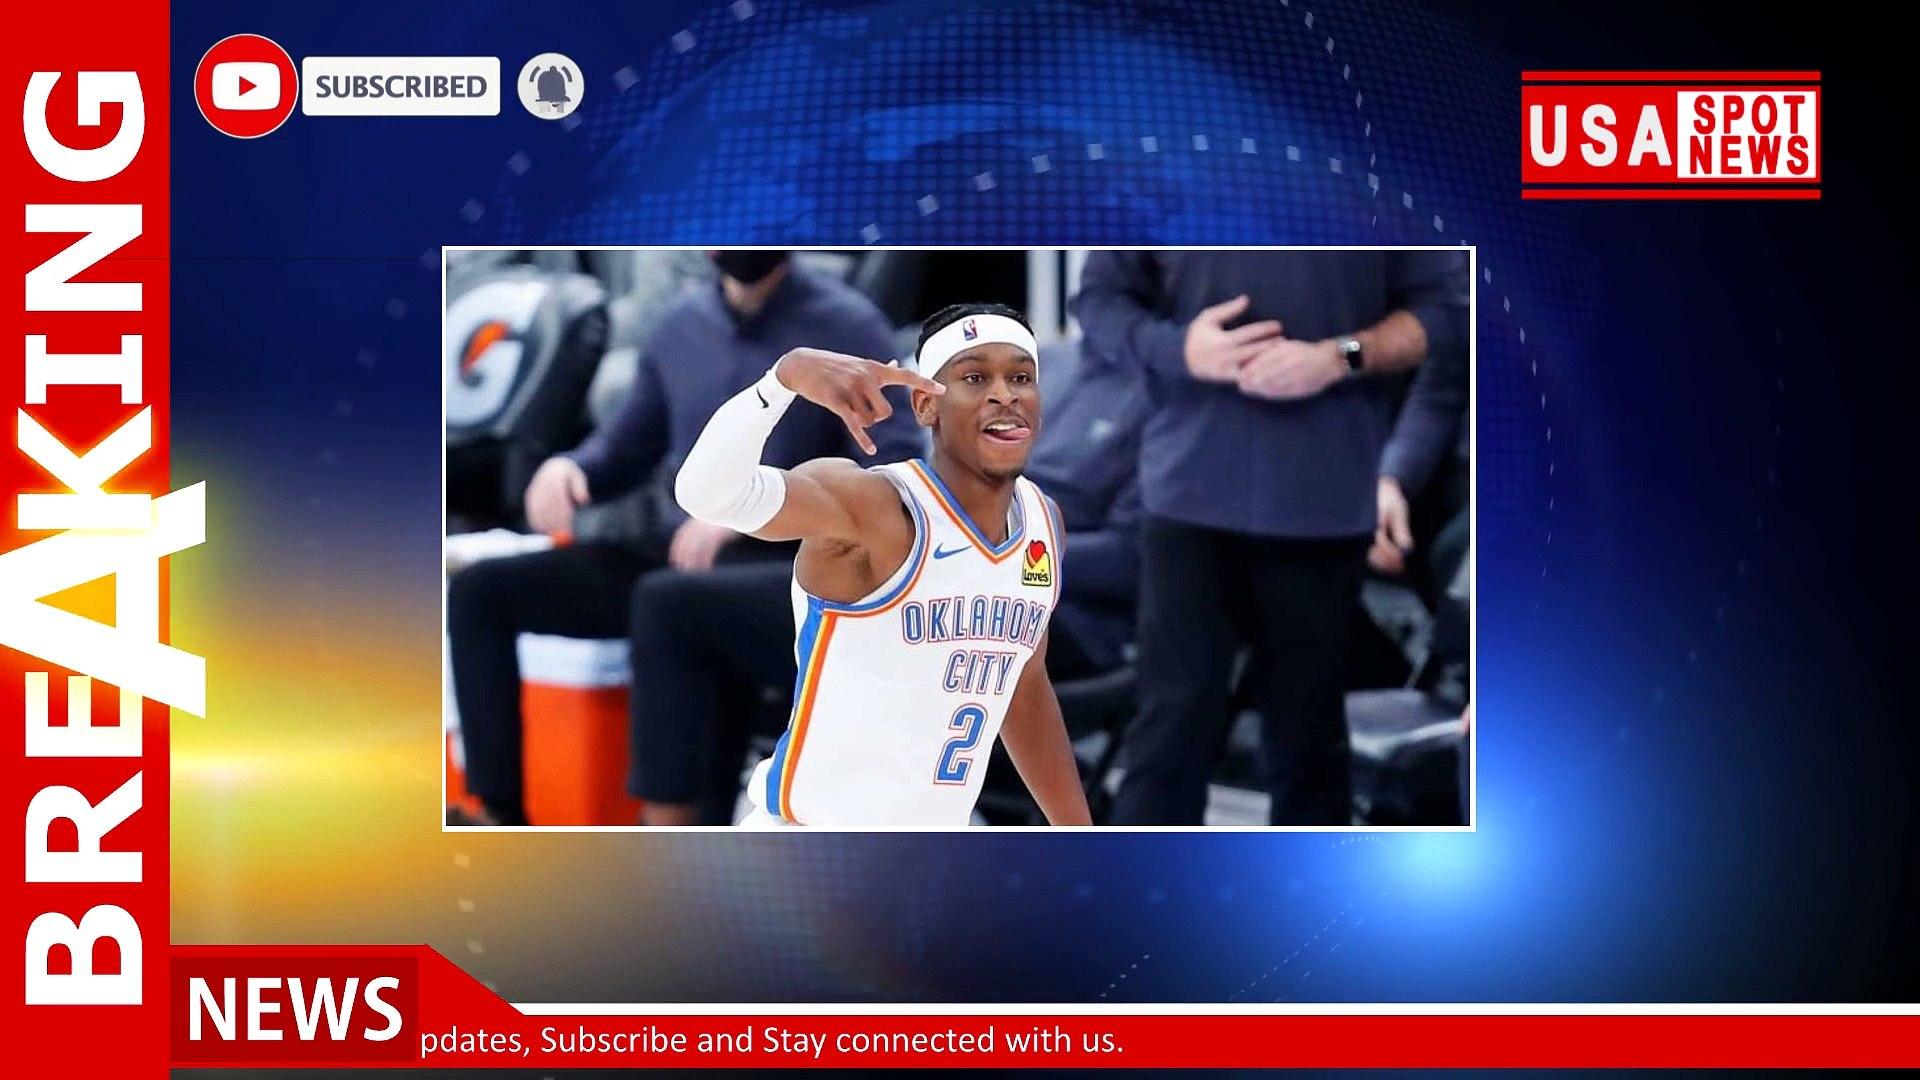 16 Jan 2021 | Morning News Headlines | Breaking News | News Today | USA Spot News